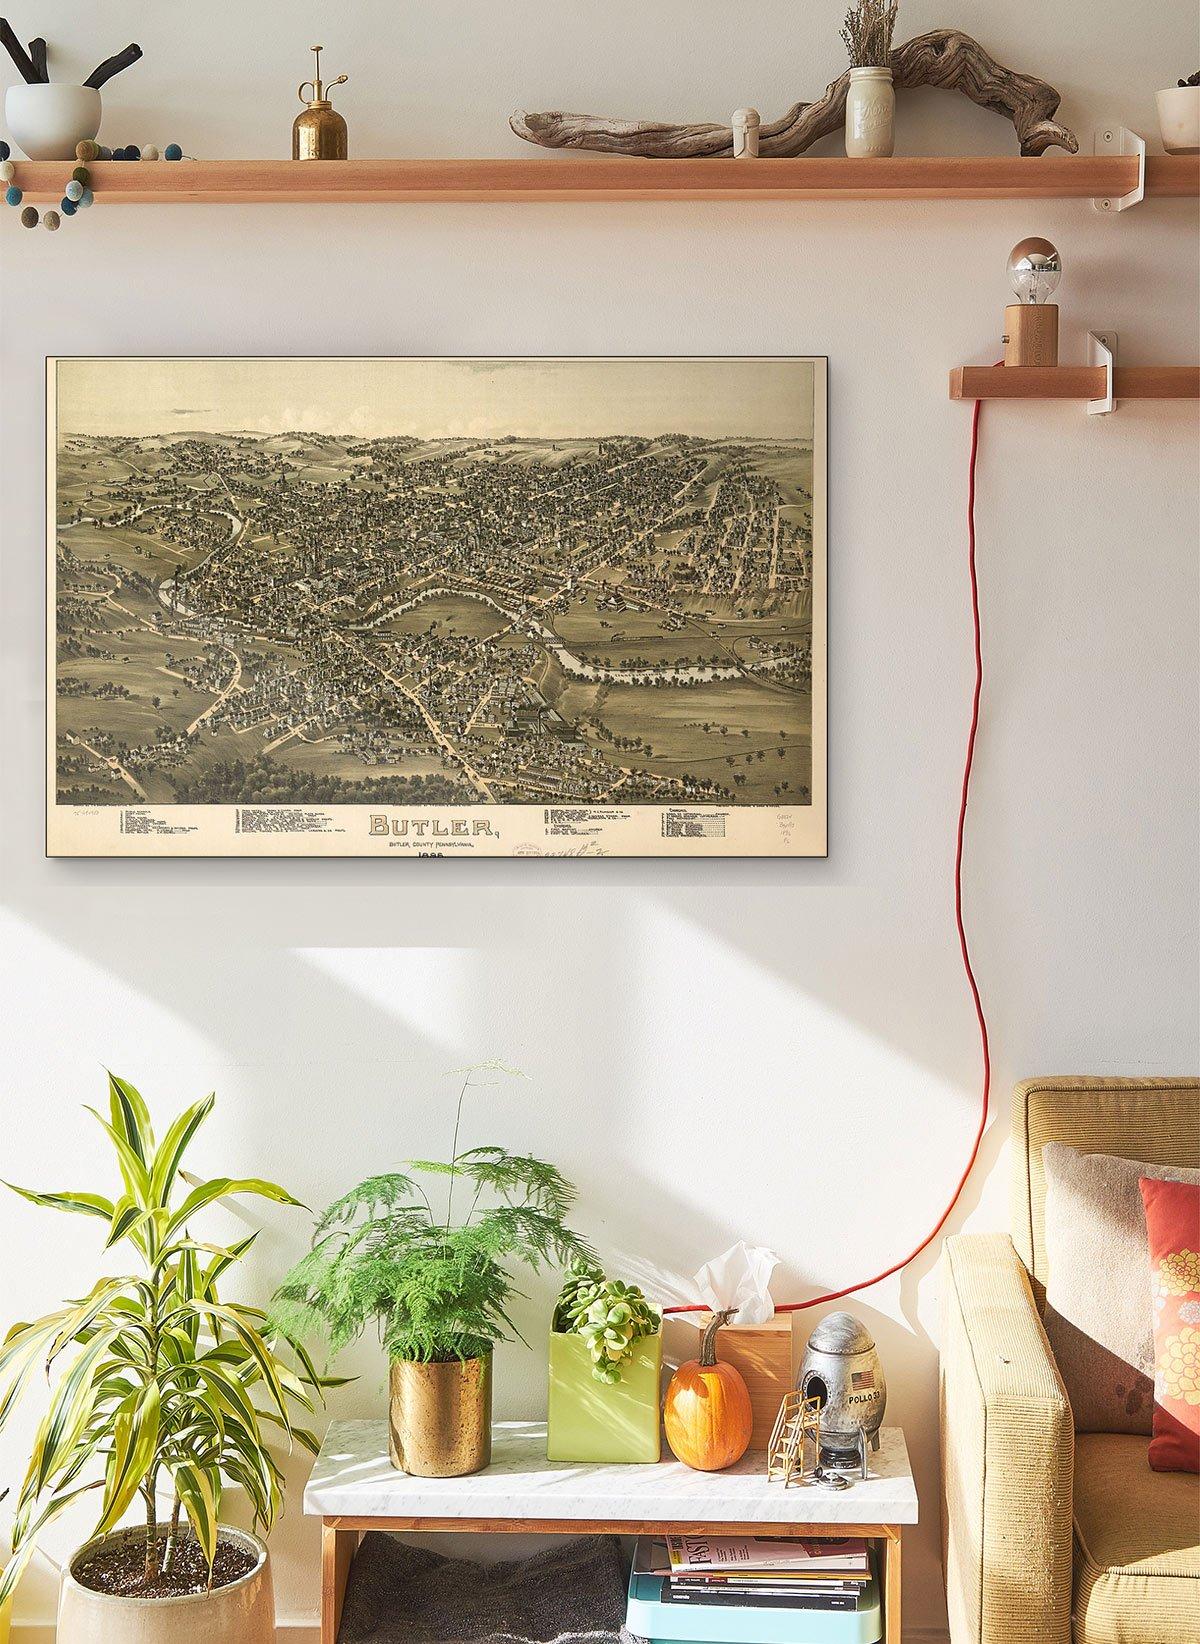 Butler Butler County Pennsylvania 1896 LARGE Vintage Map